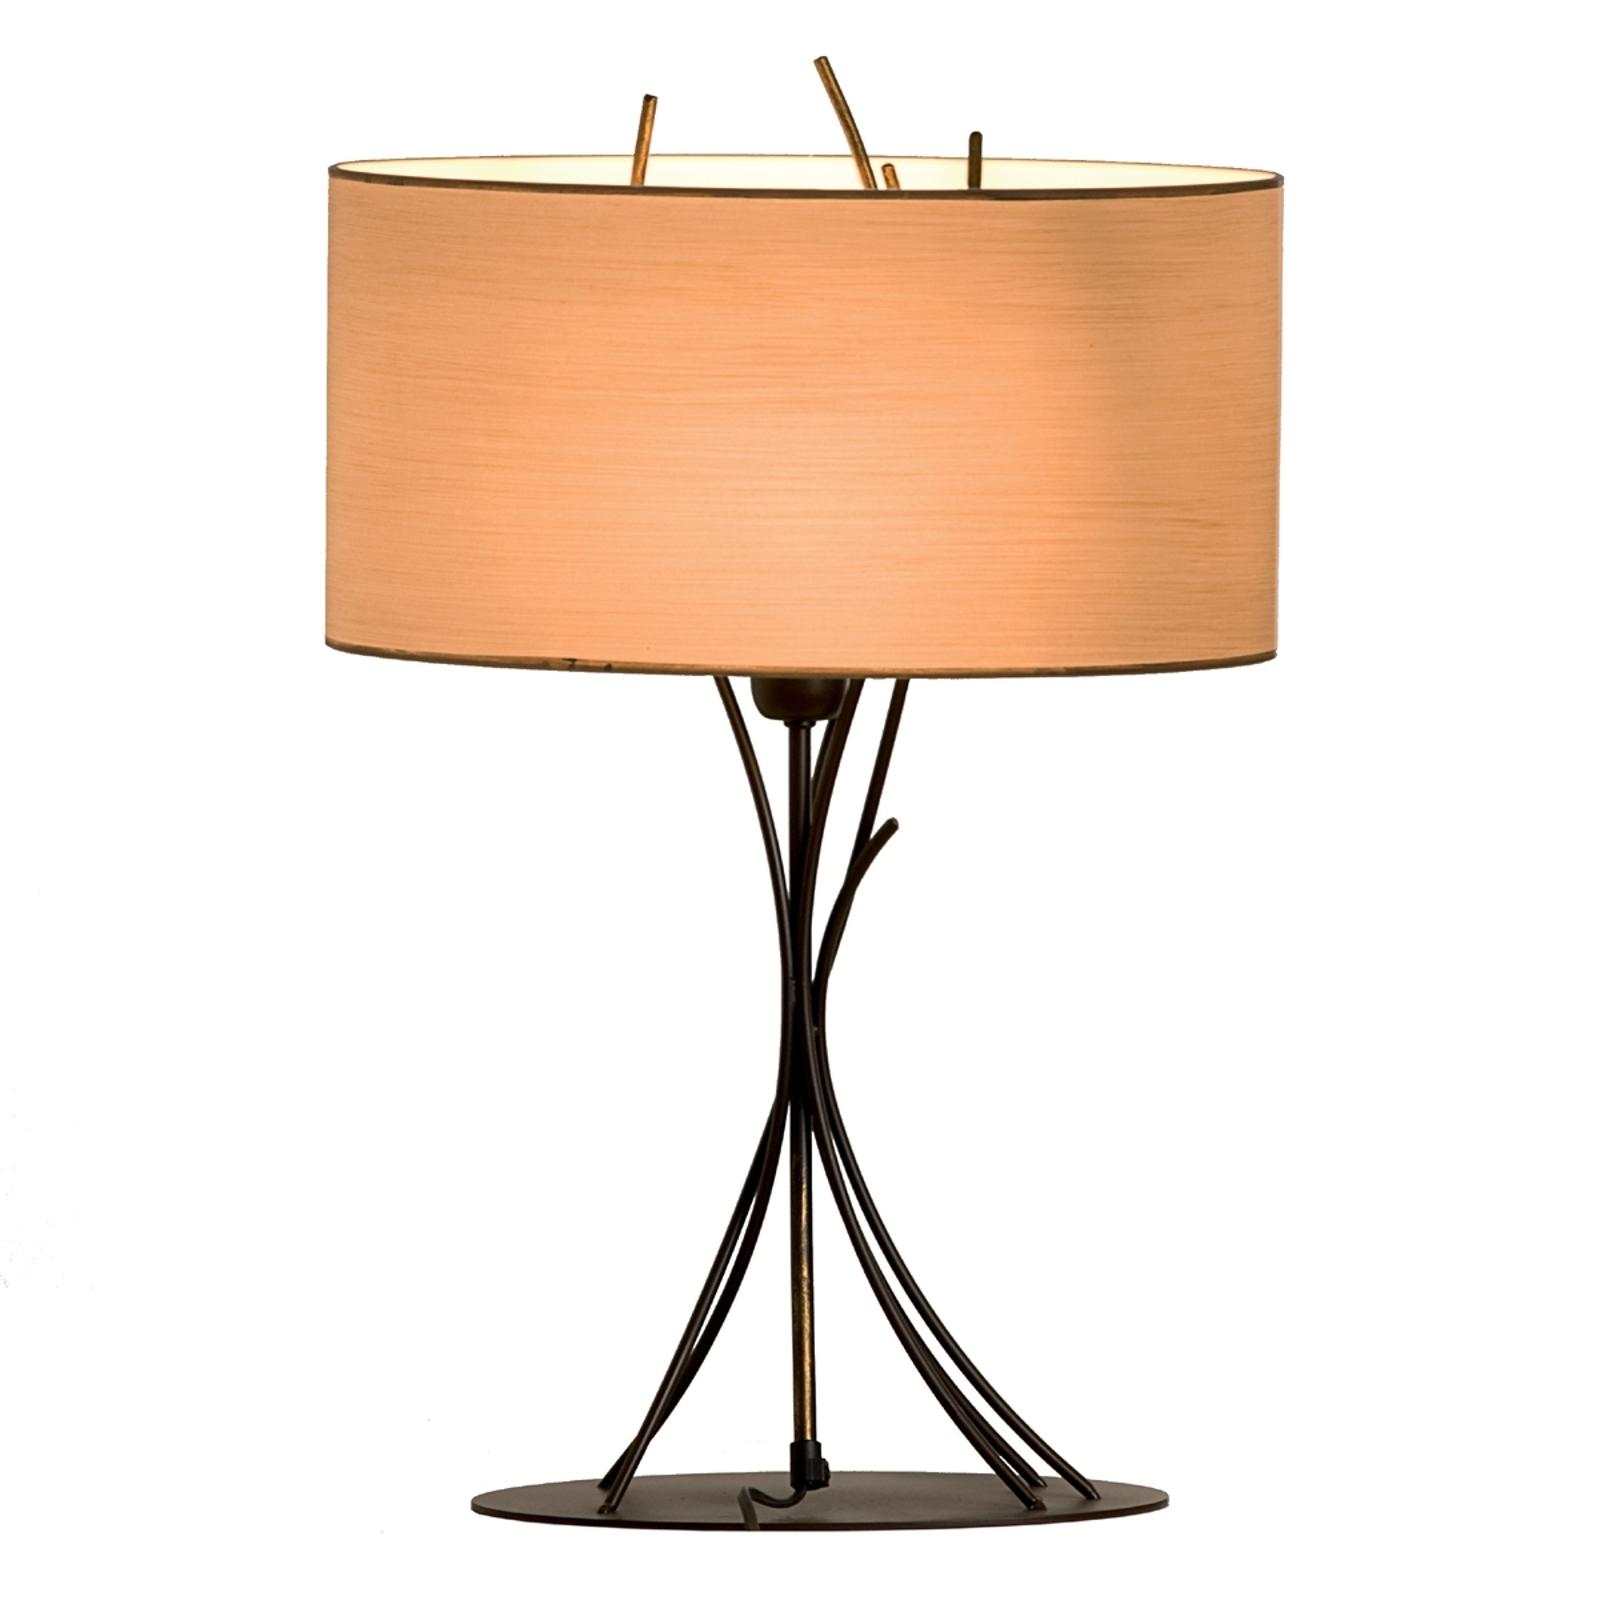 Menzel Living Oval Tischleuchte